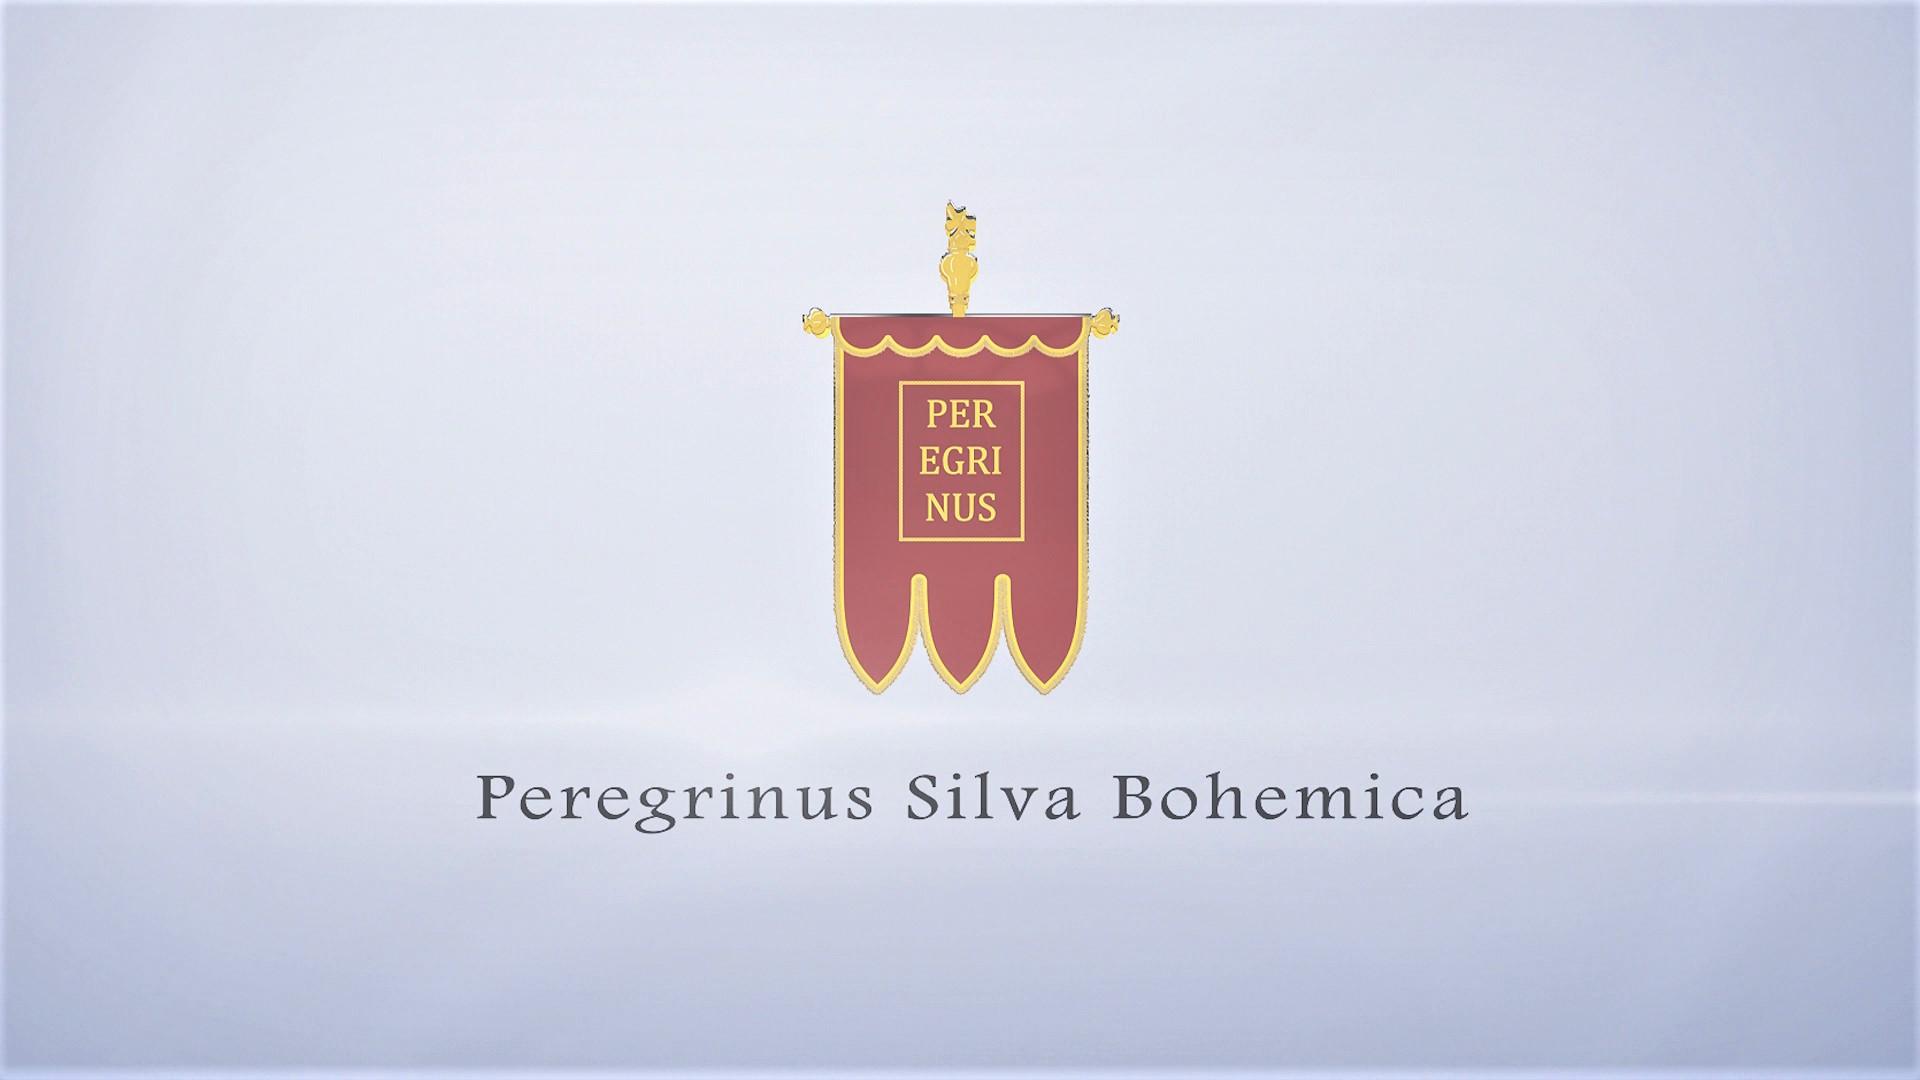 Peregrinus Silva Bohemica